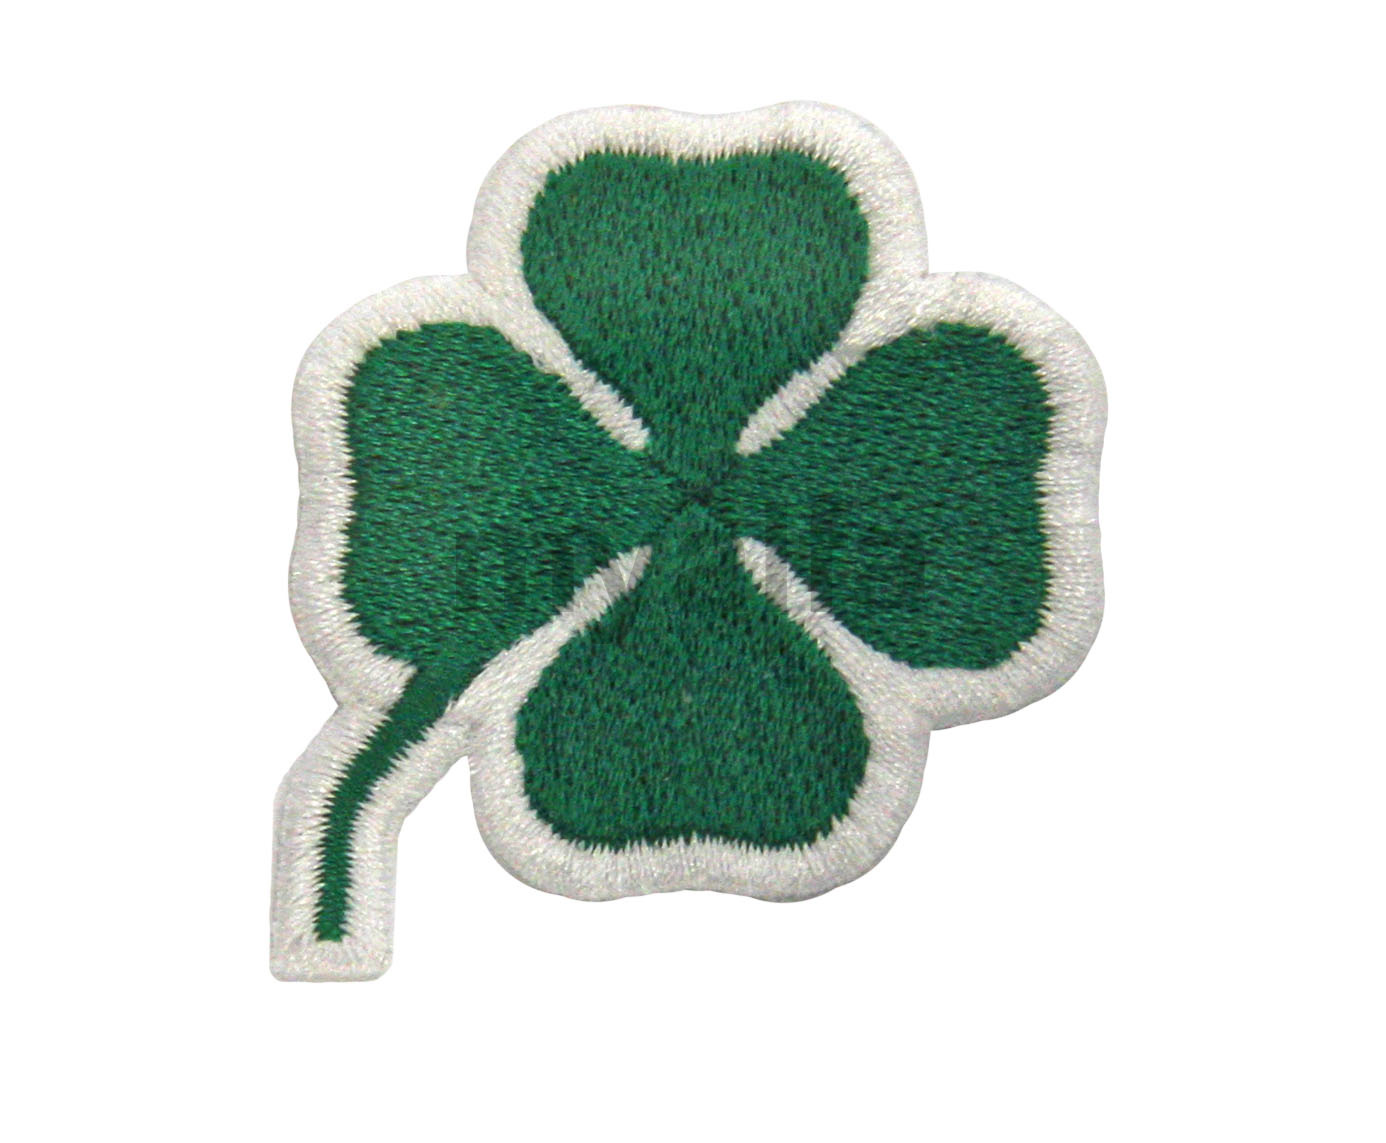 Quadrifoglio emblem embroidery for Alfa Romeo, Accessories, Embroidered patches